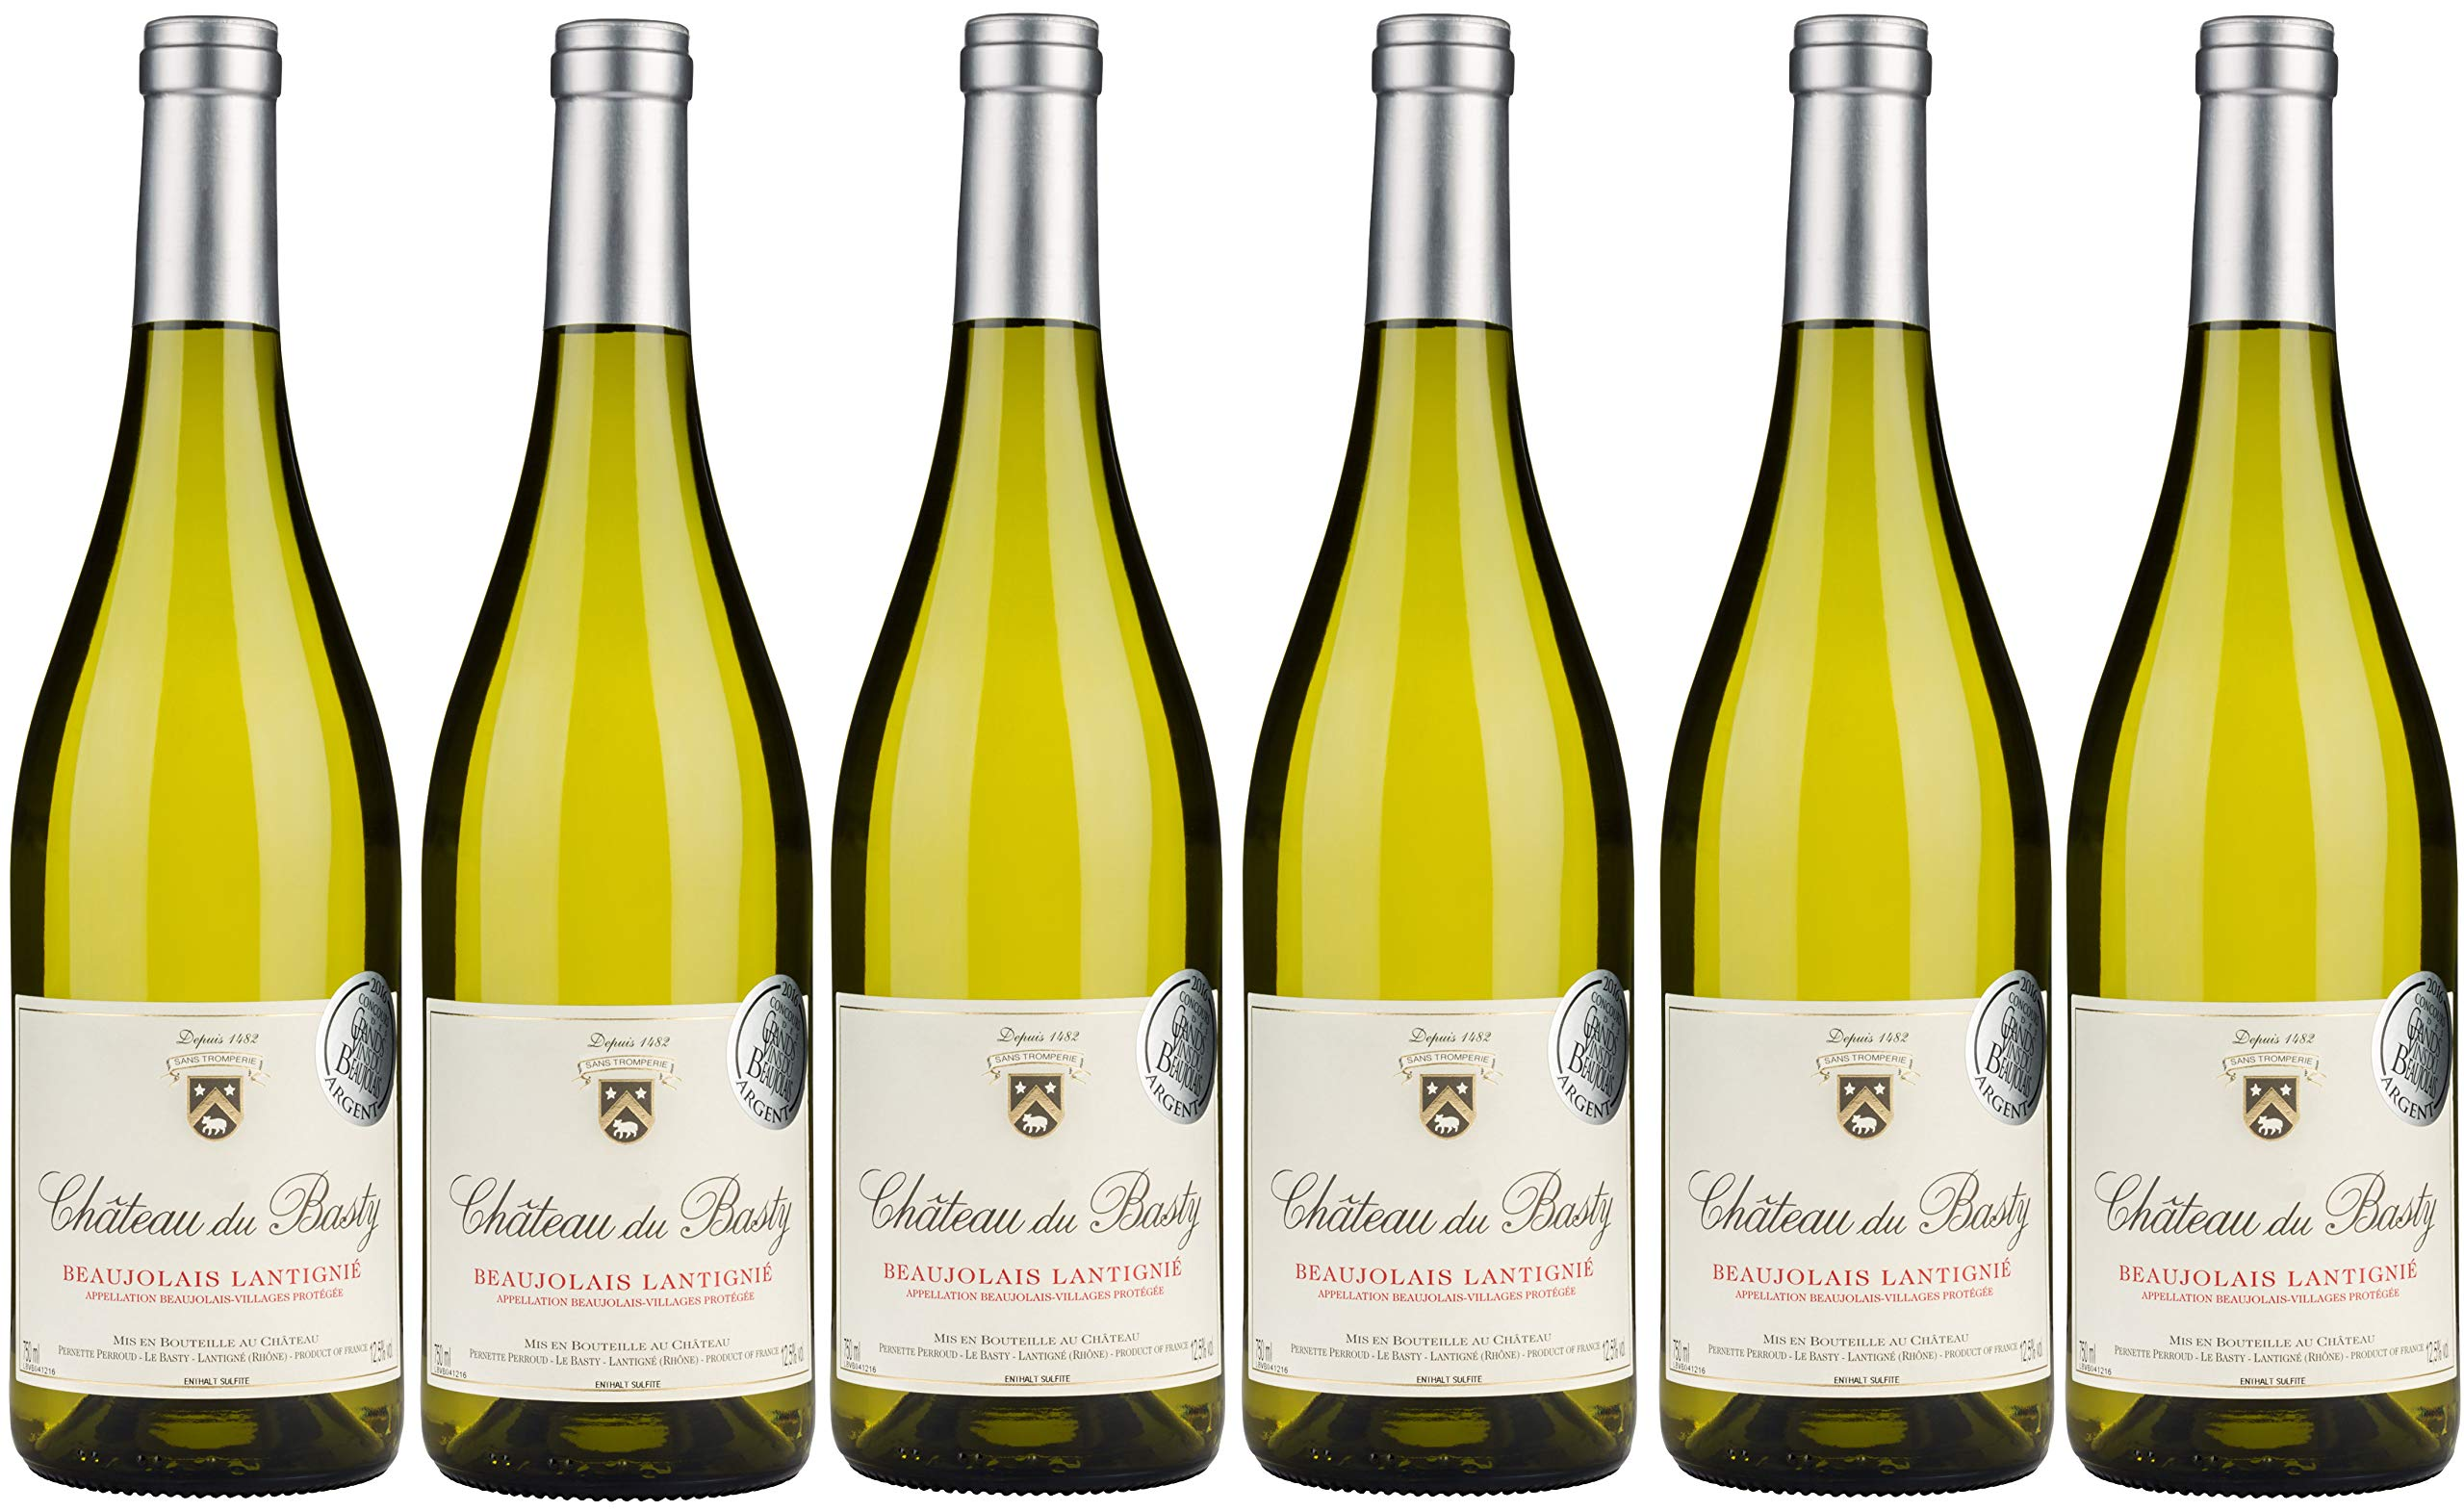 Chteau-du-Basty-Beaujolais-Latigni-Weiwein-trocken